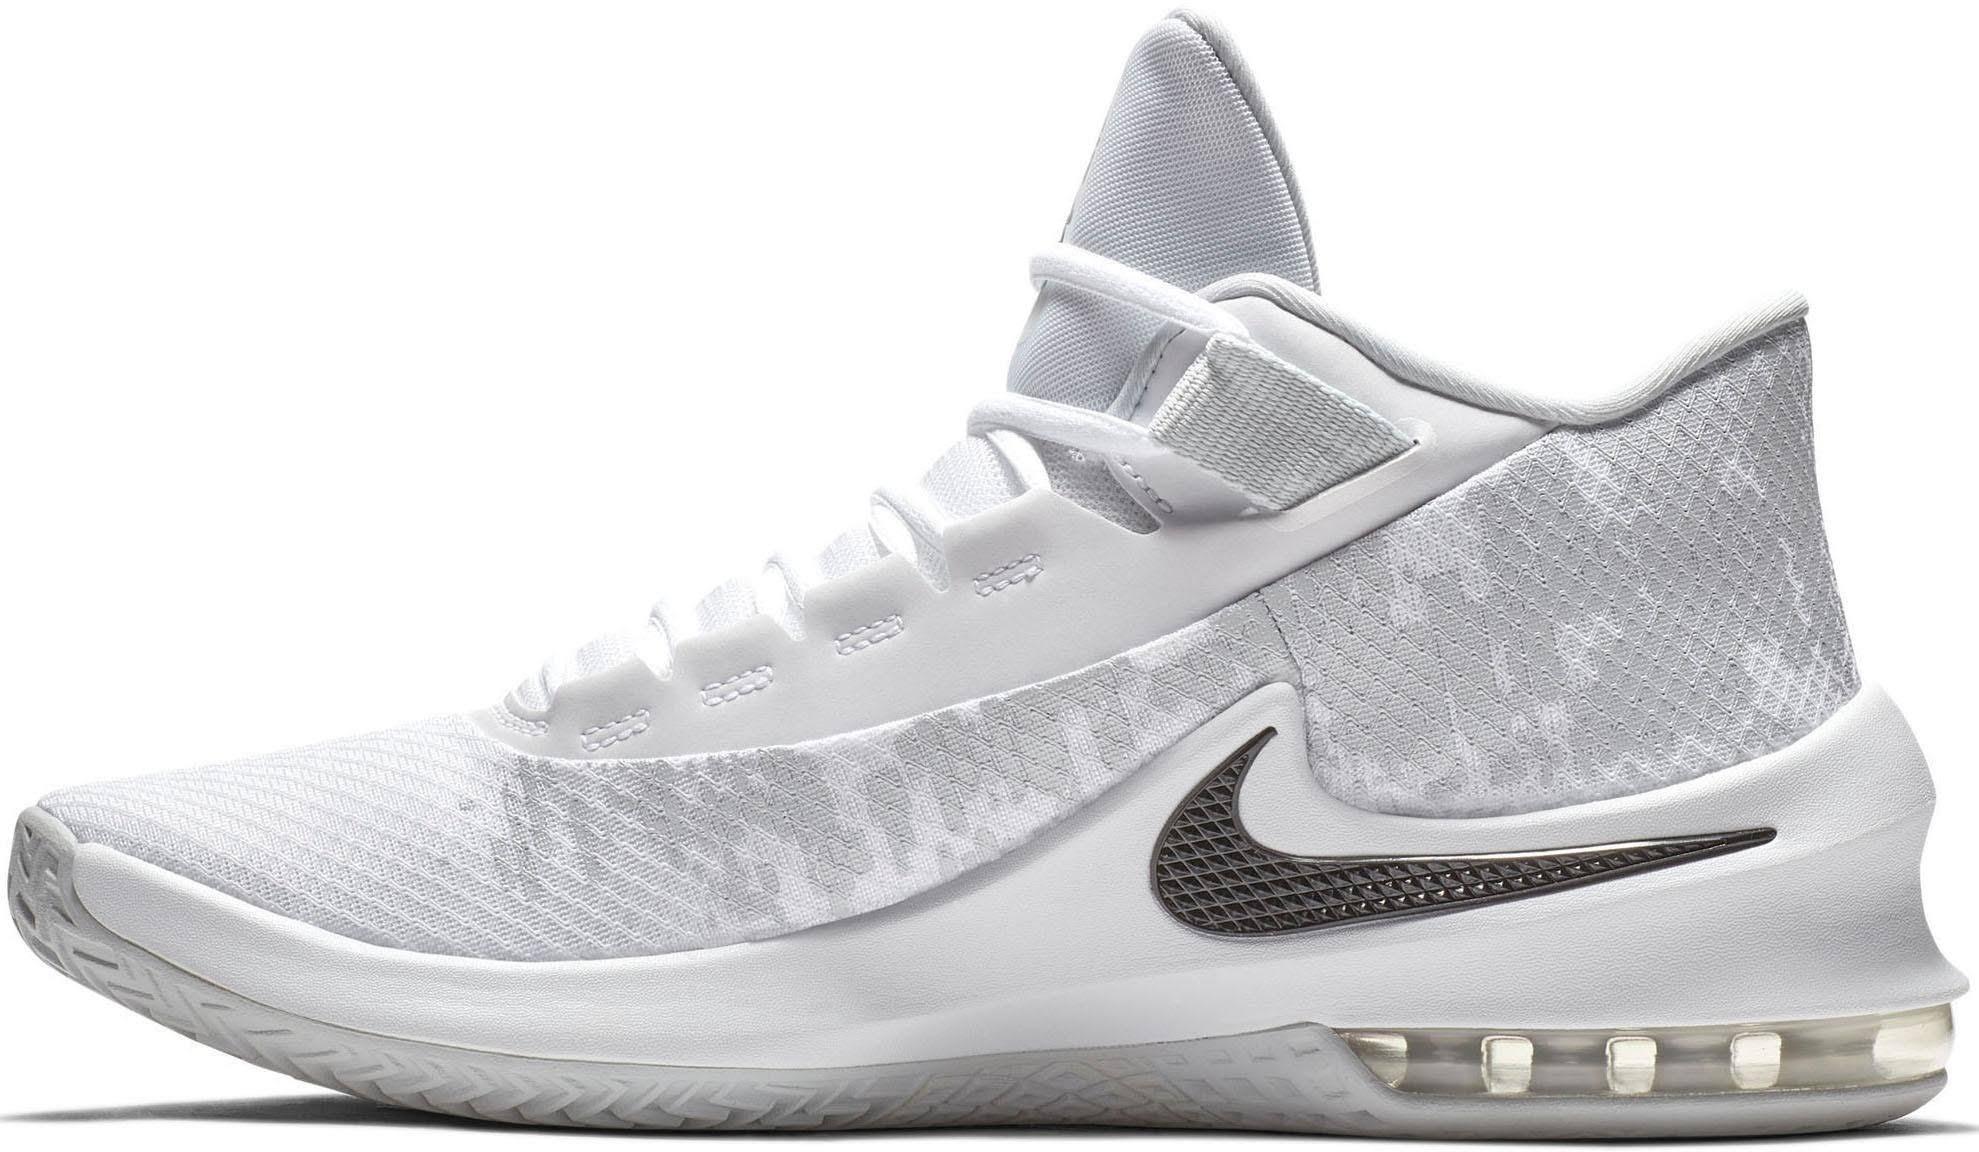 Max Air Zwart Nike Basketbalschoenen Infuriate 2 Wit 0wOnPk8X